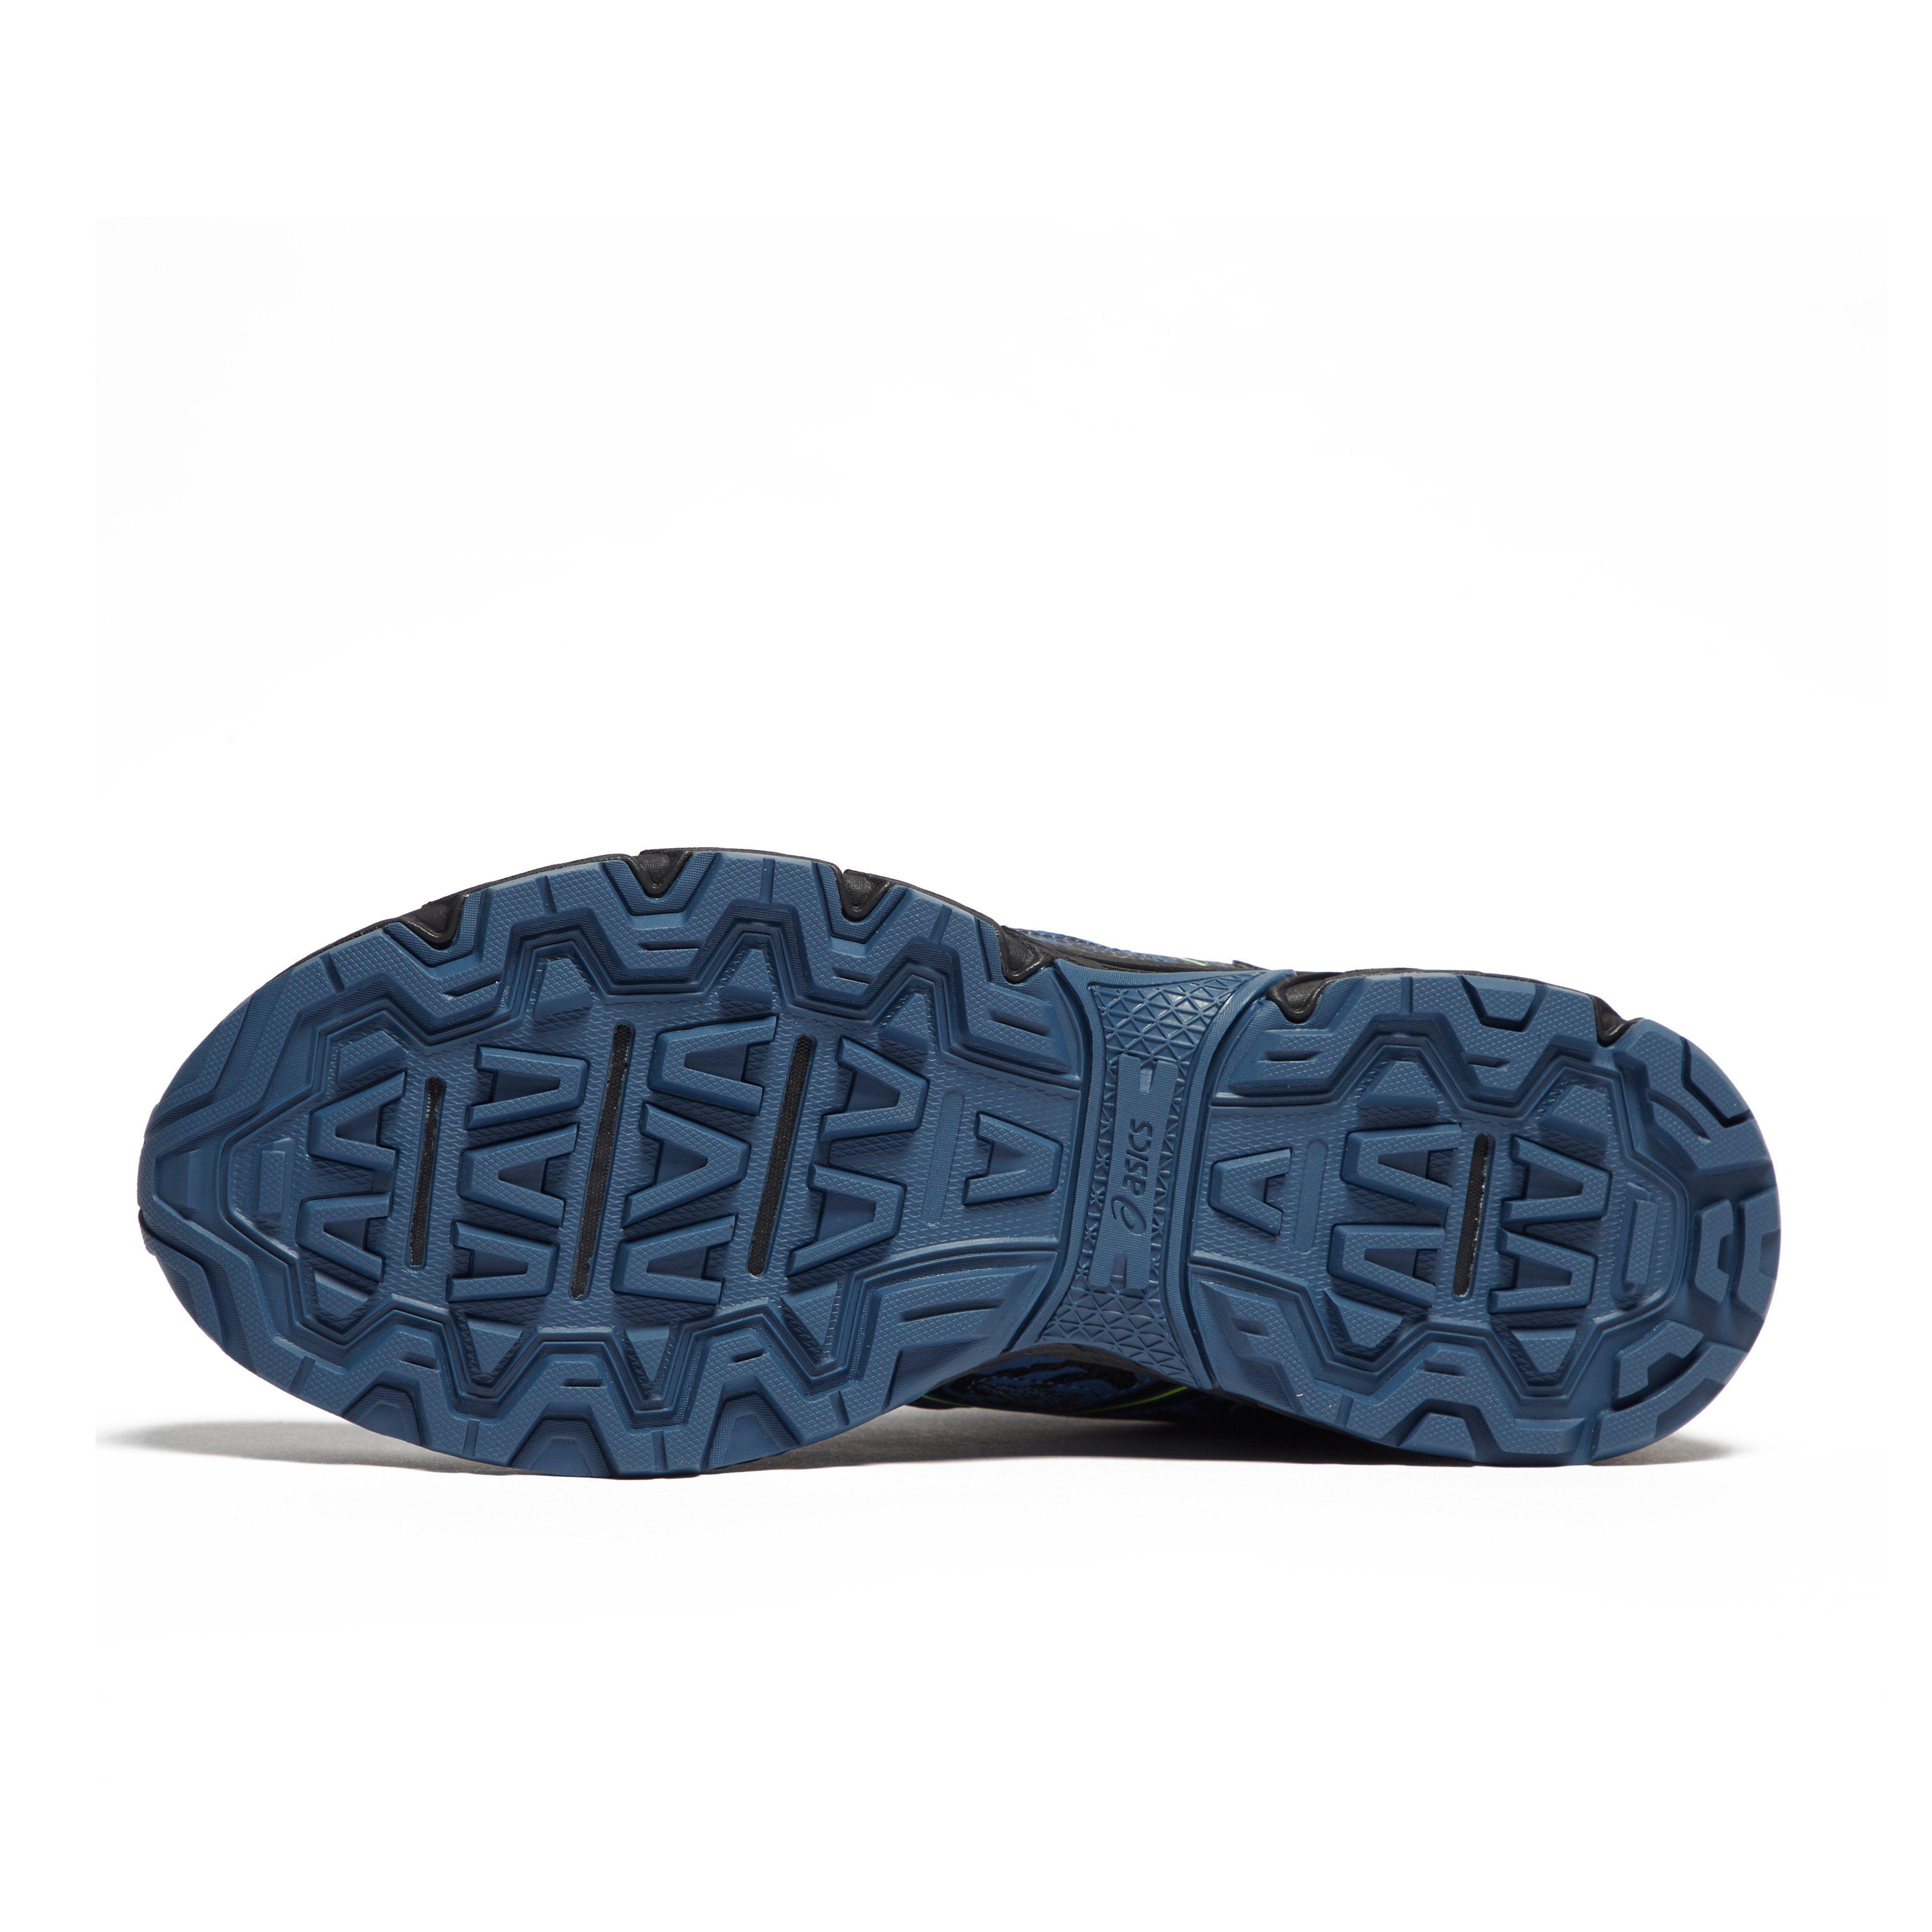 ASICS Gel-Venture 6 Men's Trail Running Shoes